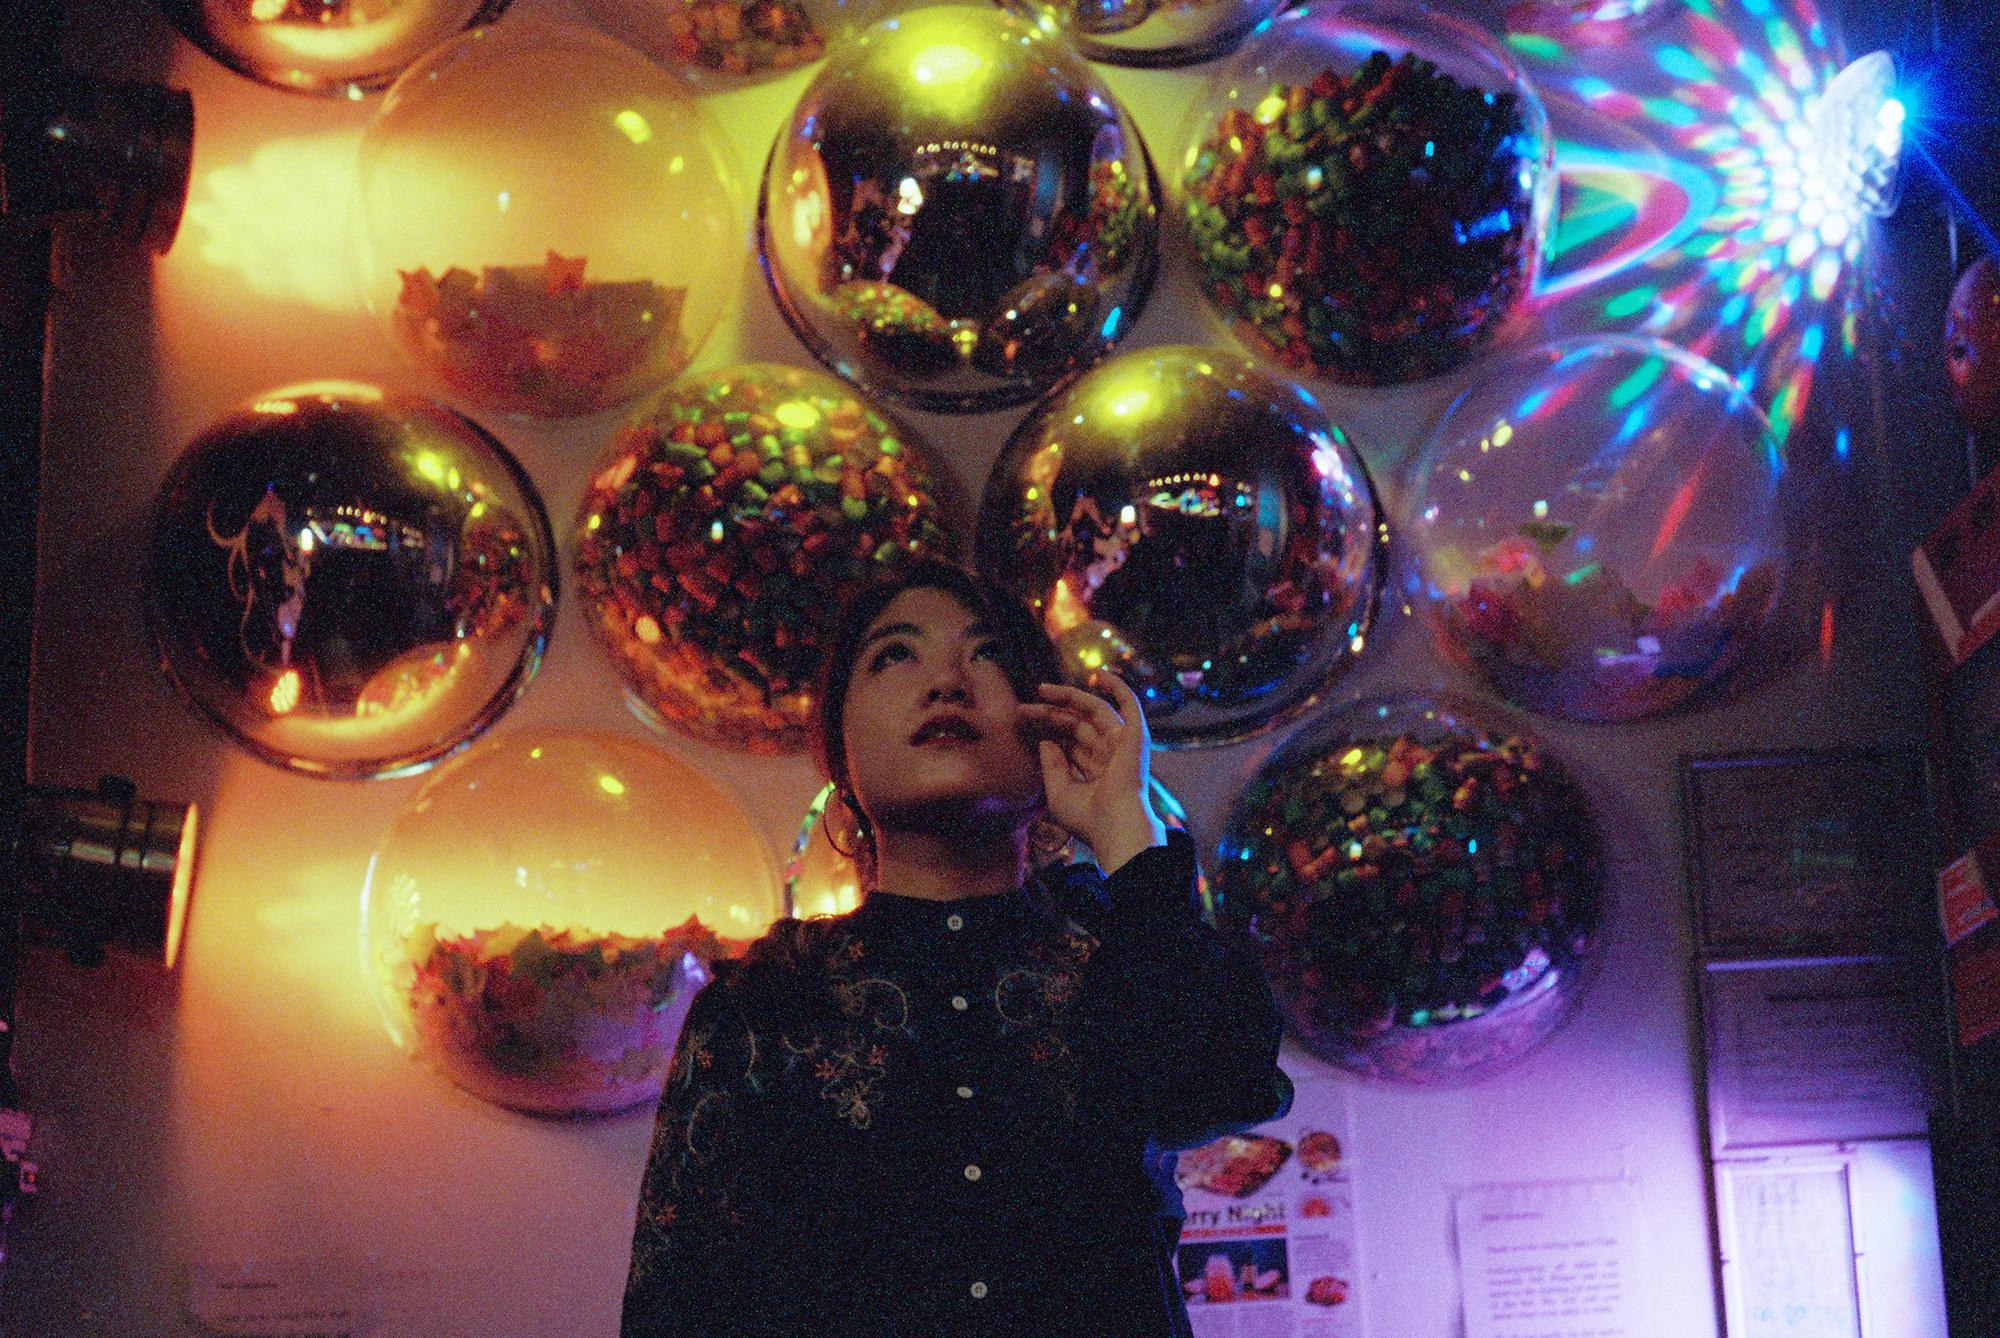 A woman looking up at balloons